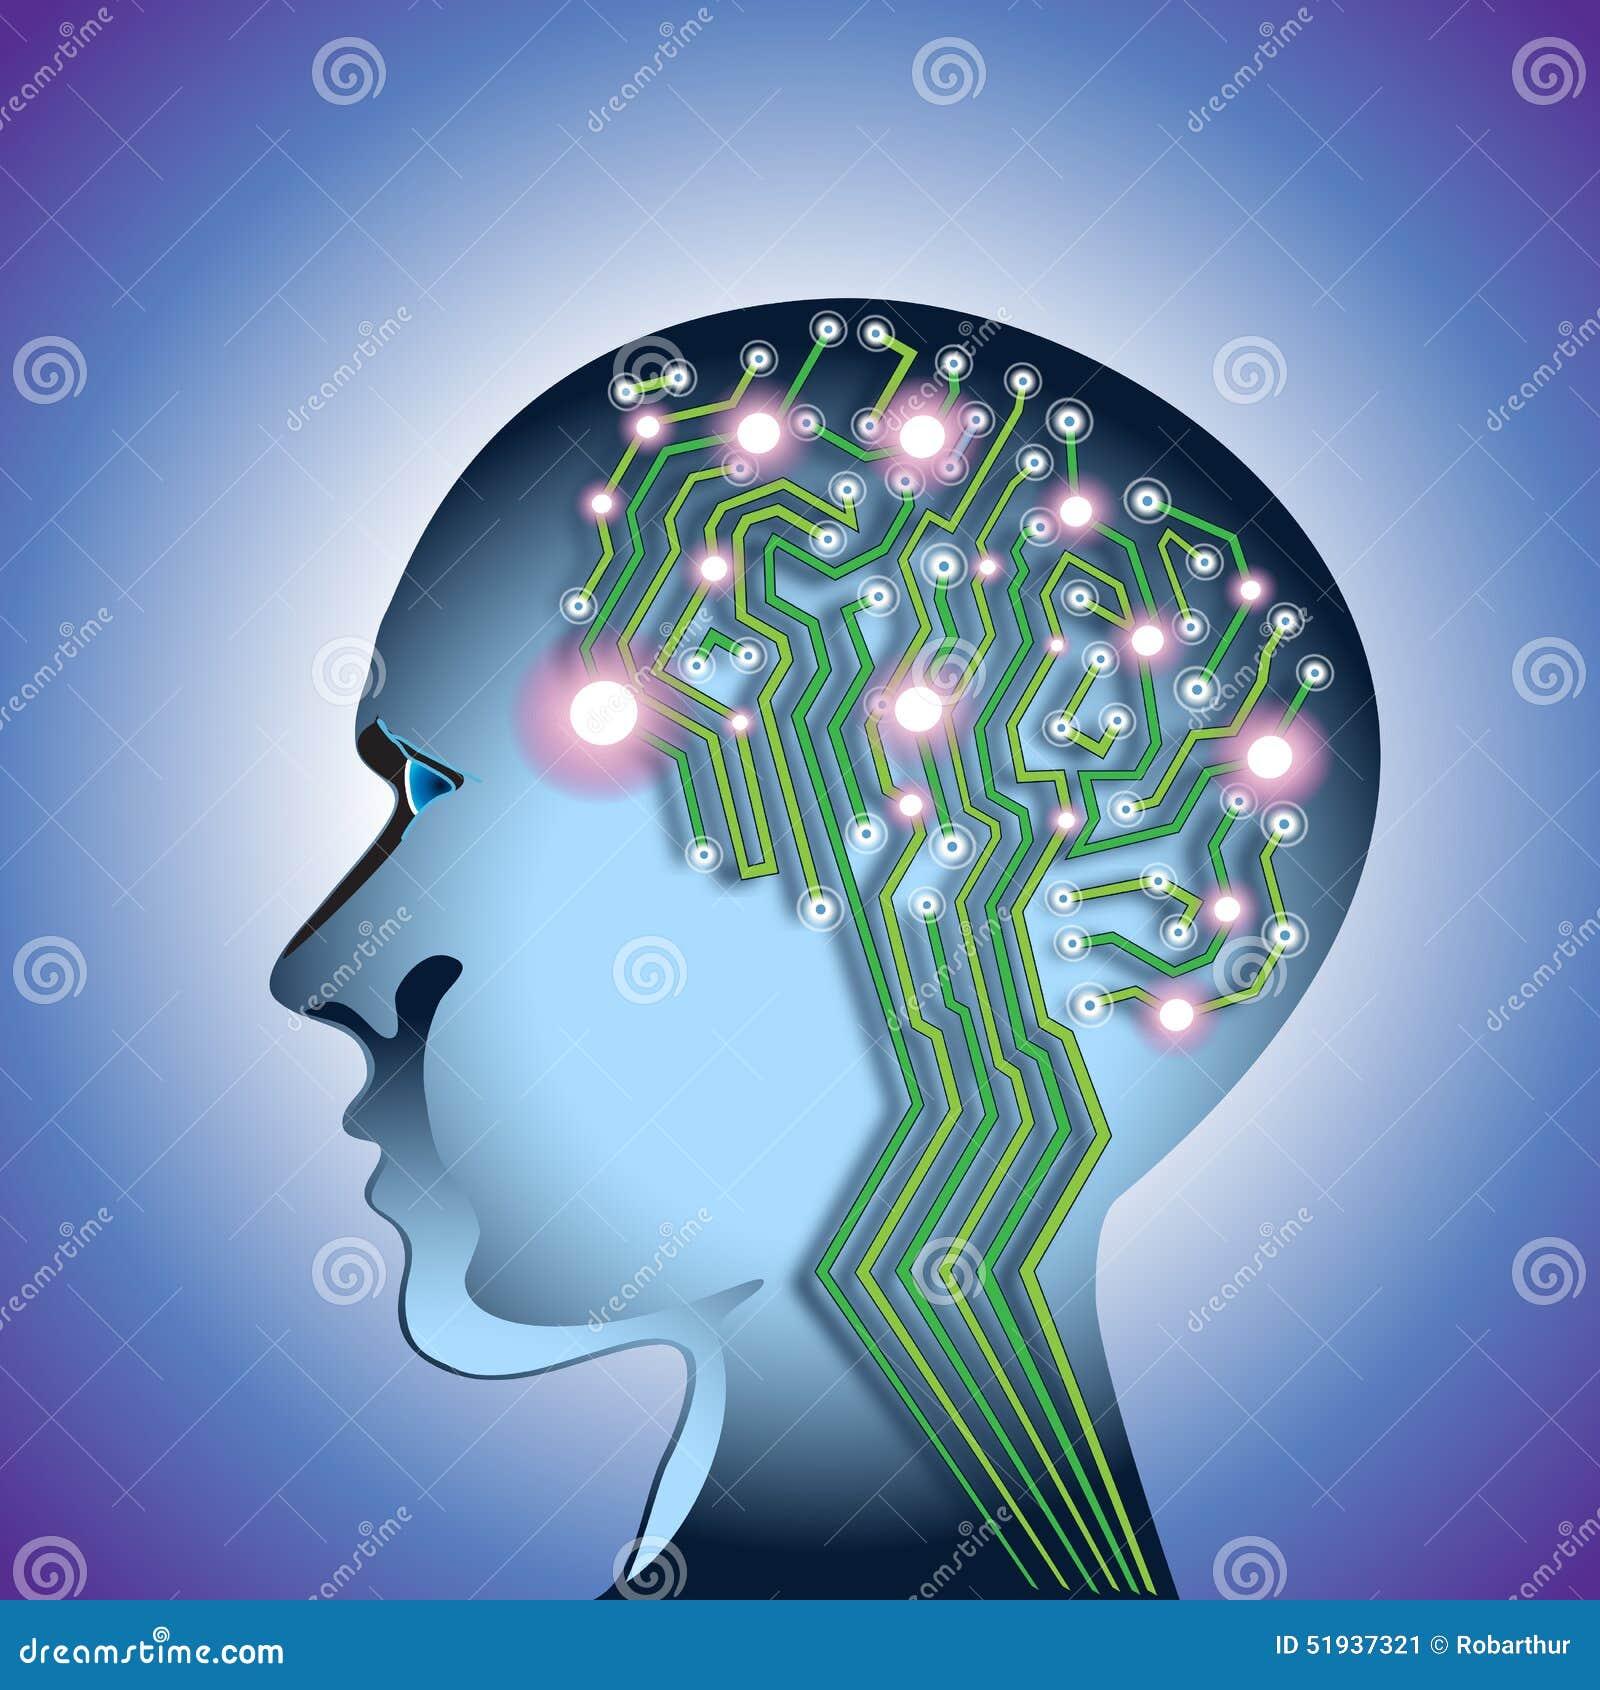 Abstract Brain Circuit Stock Vector - Image: 51937321